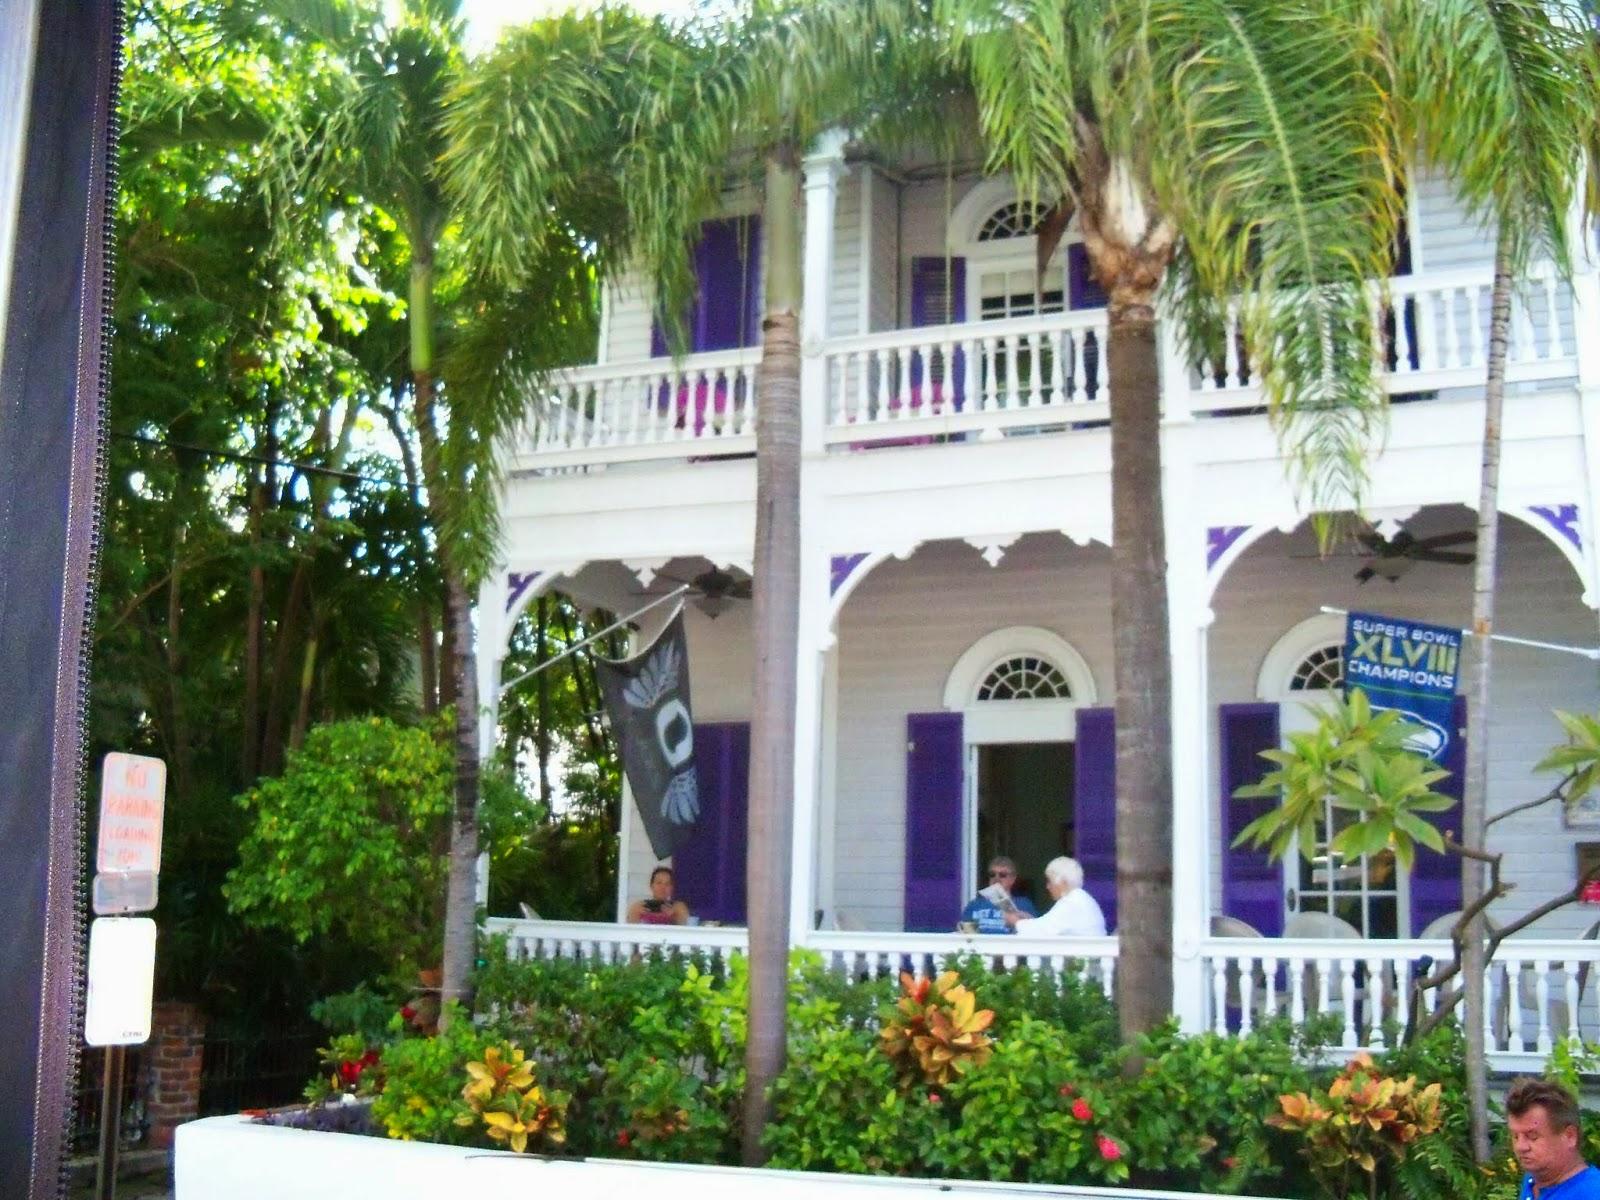 Key West Vacation - 116_5646.JPG